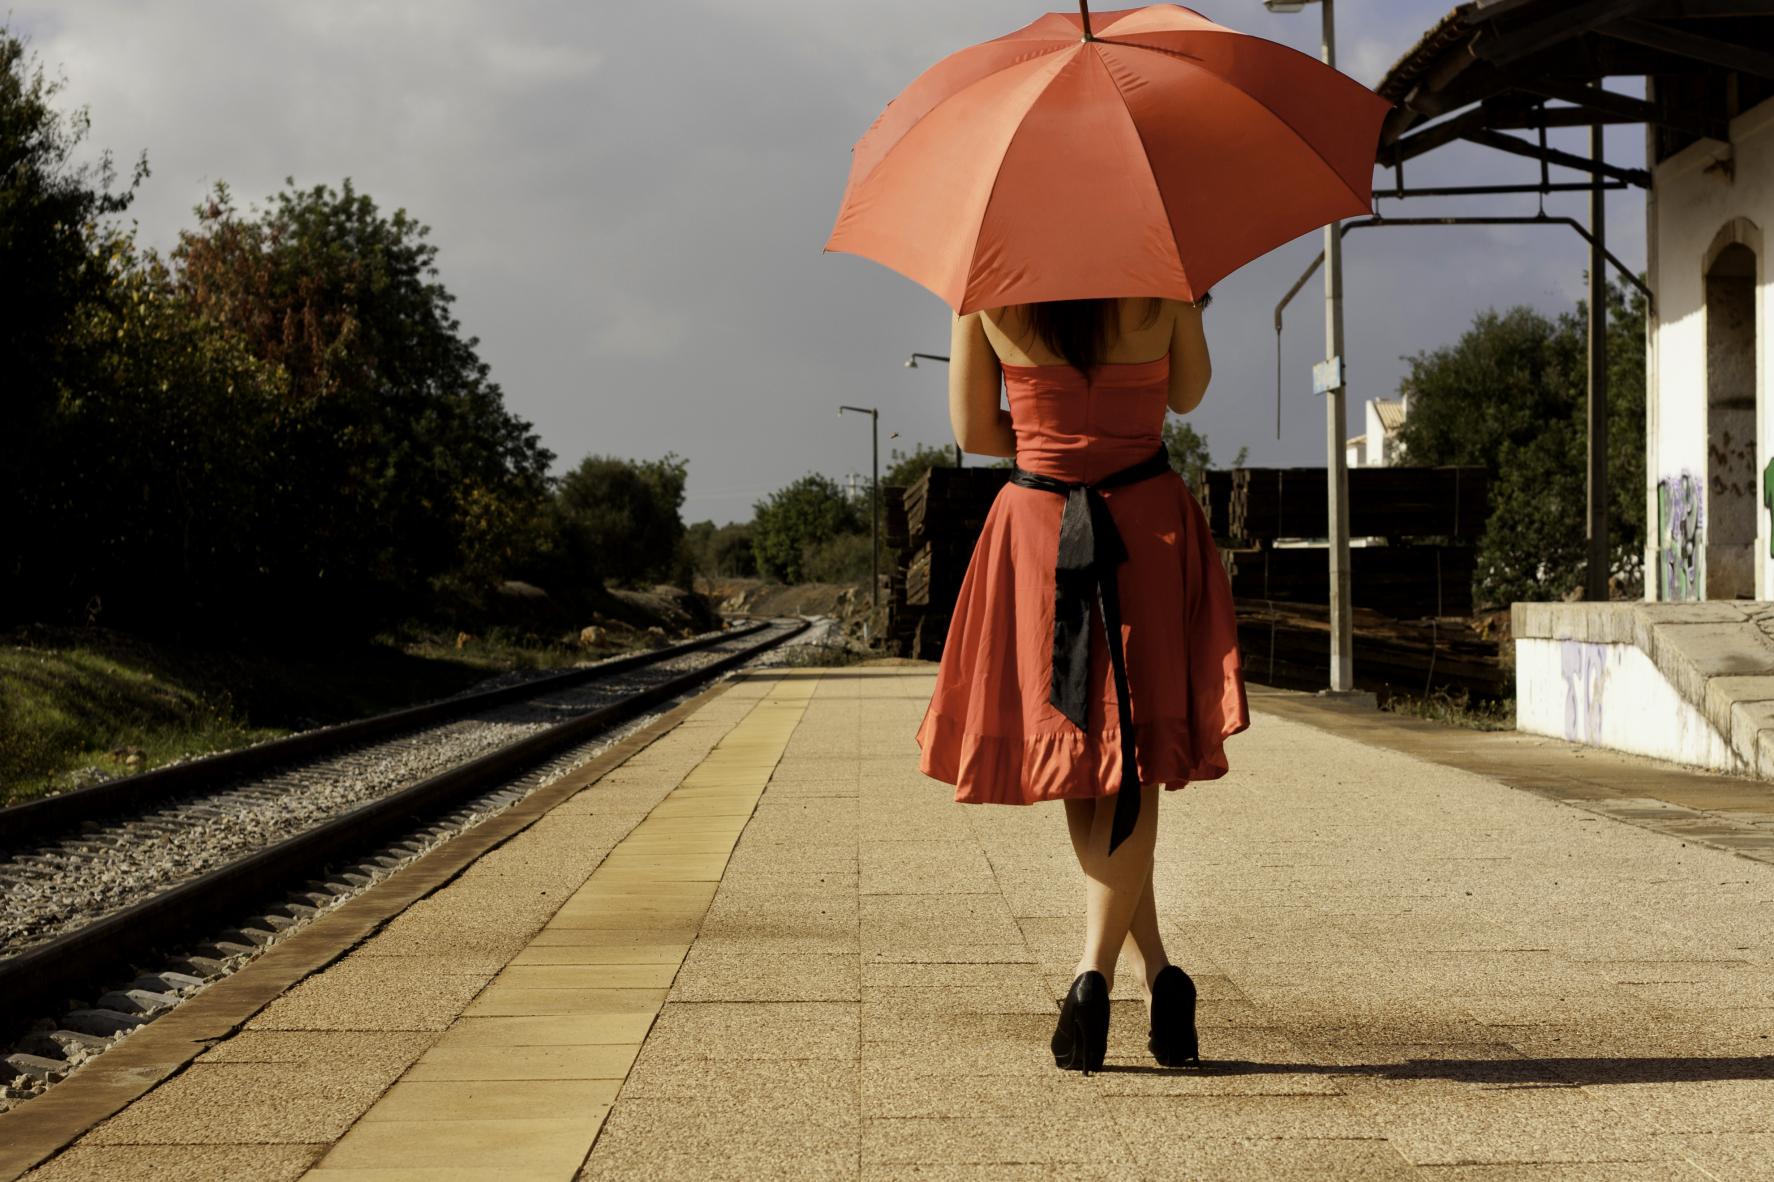 Kozzi-beautiful-woman-with-umbrella-1774 X 1183